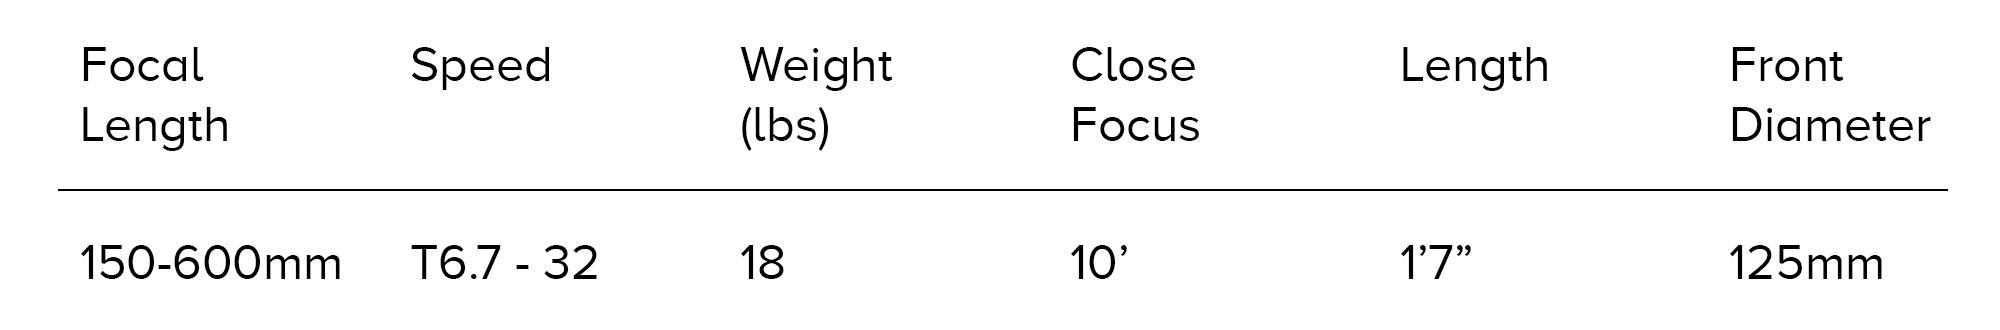 Century-150-600-Specs.png